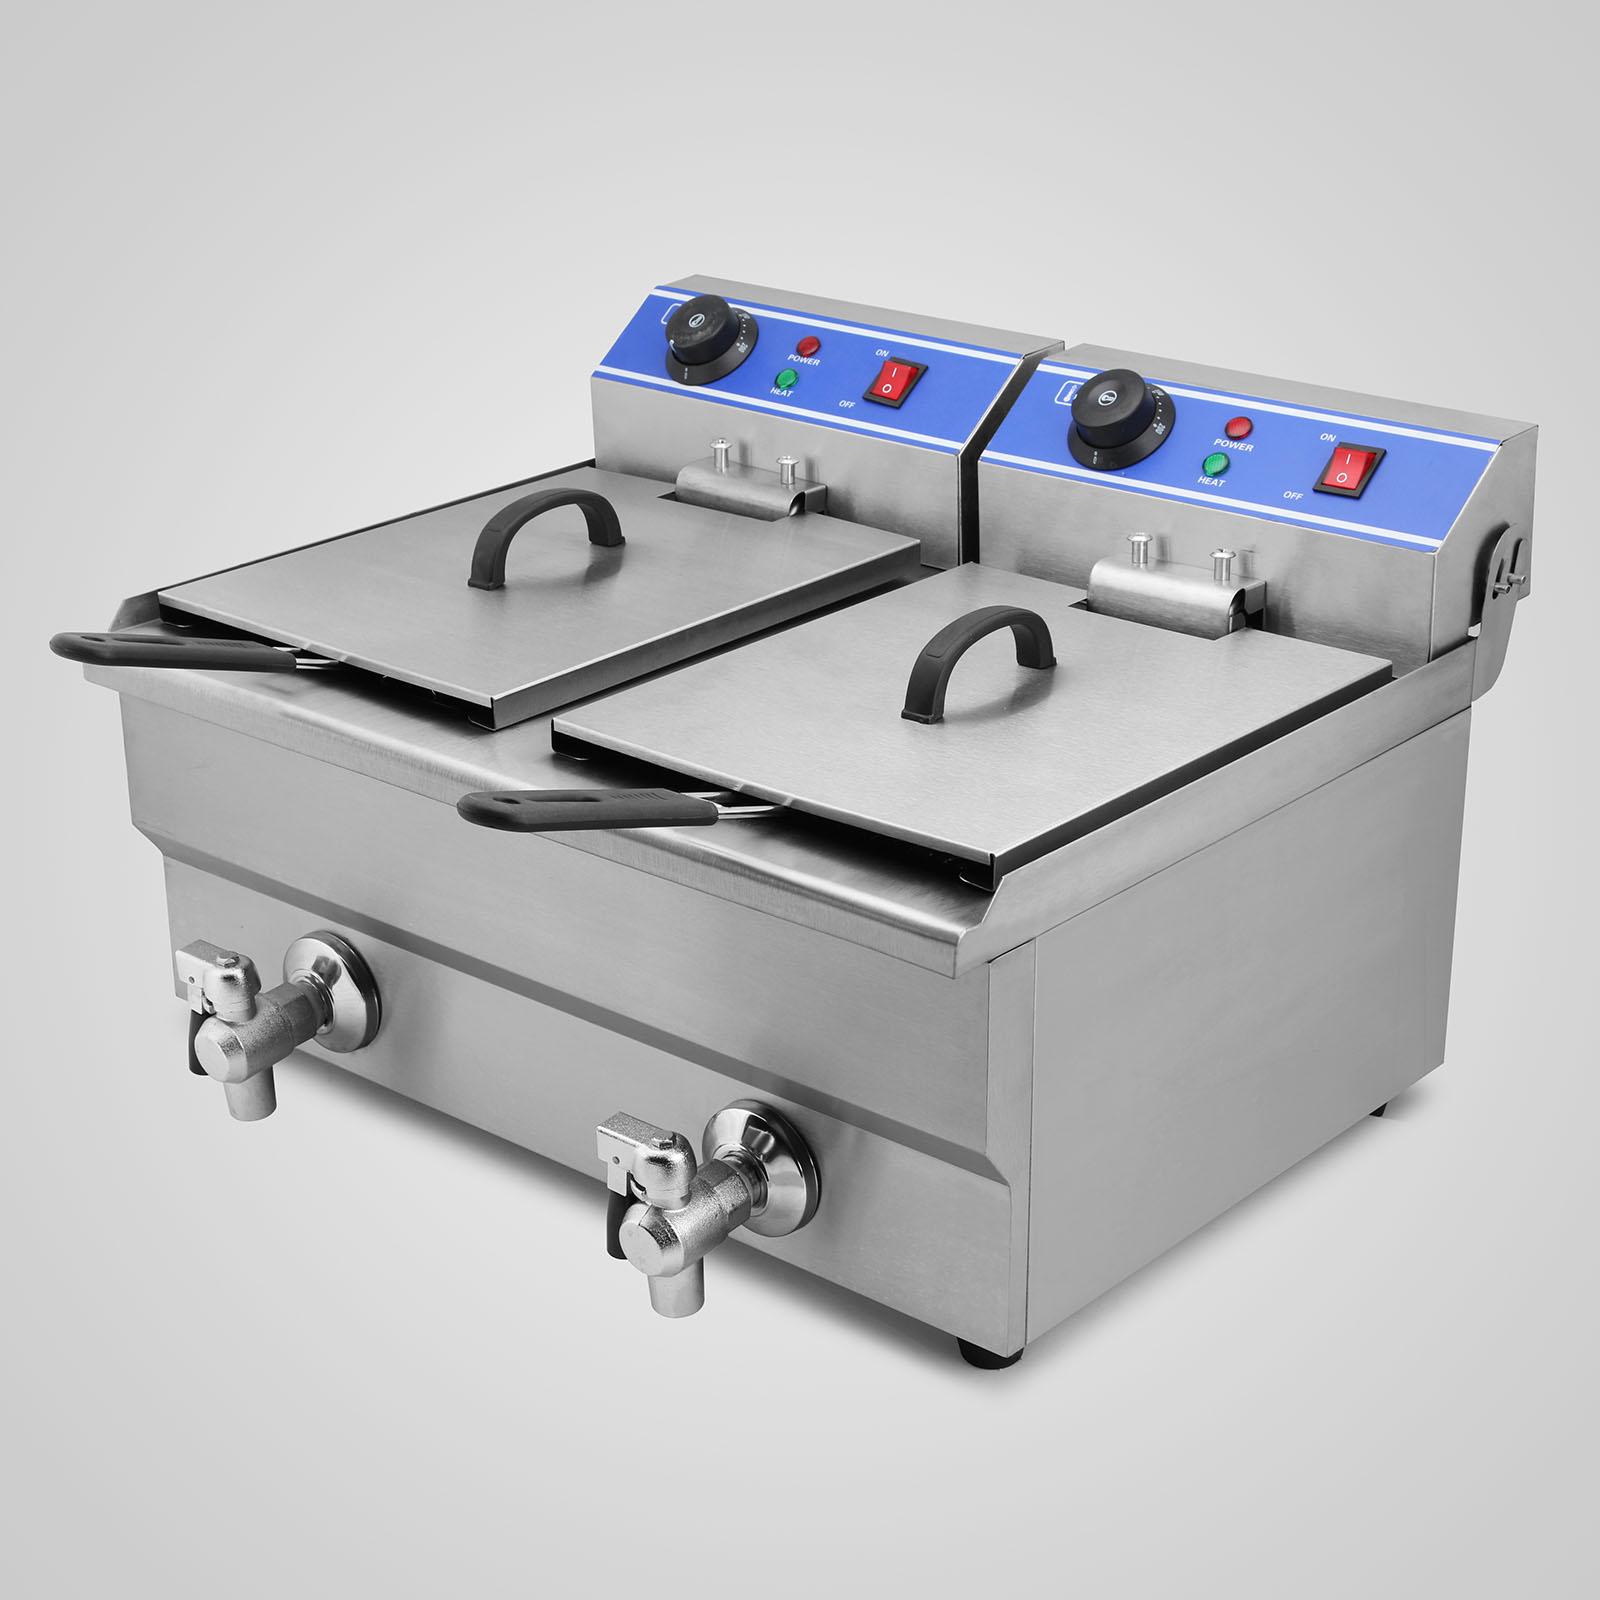 20L Electric Deep Fryer Dual Tank Commercial Restaurant